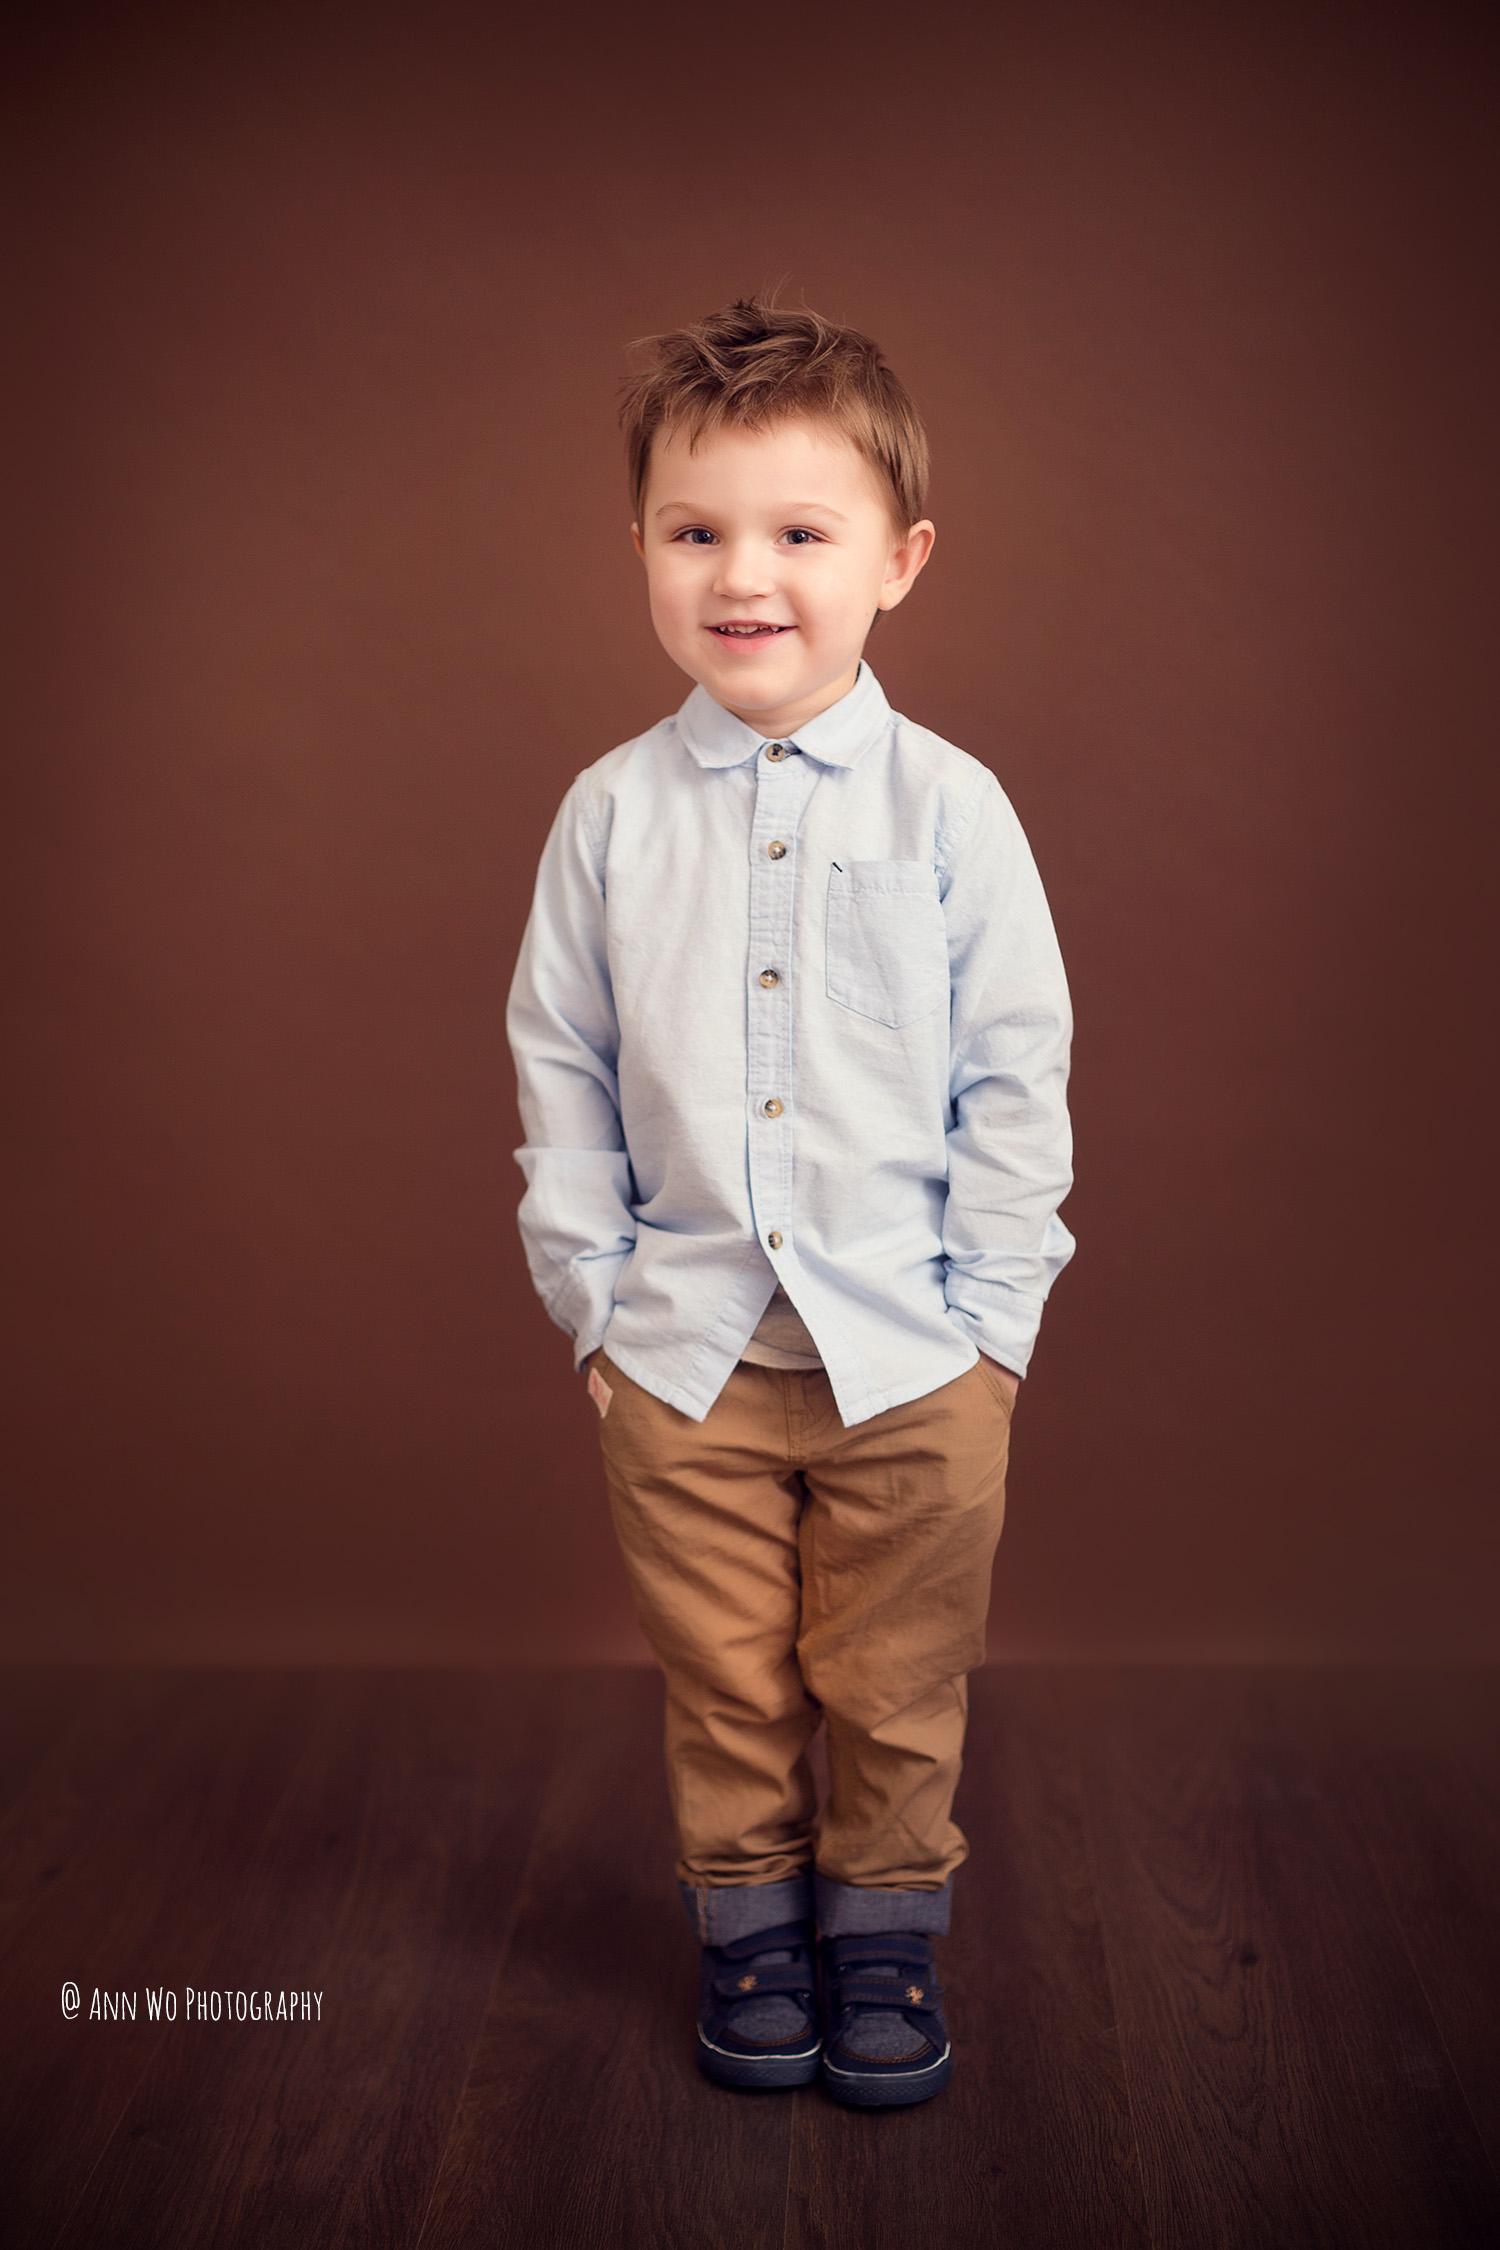 ann-wo-photography-toddler-london.jpg